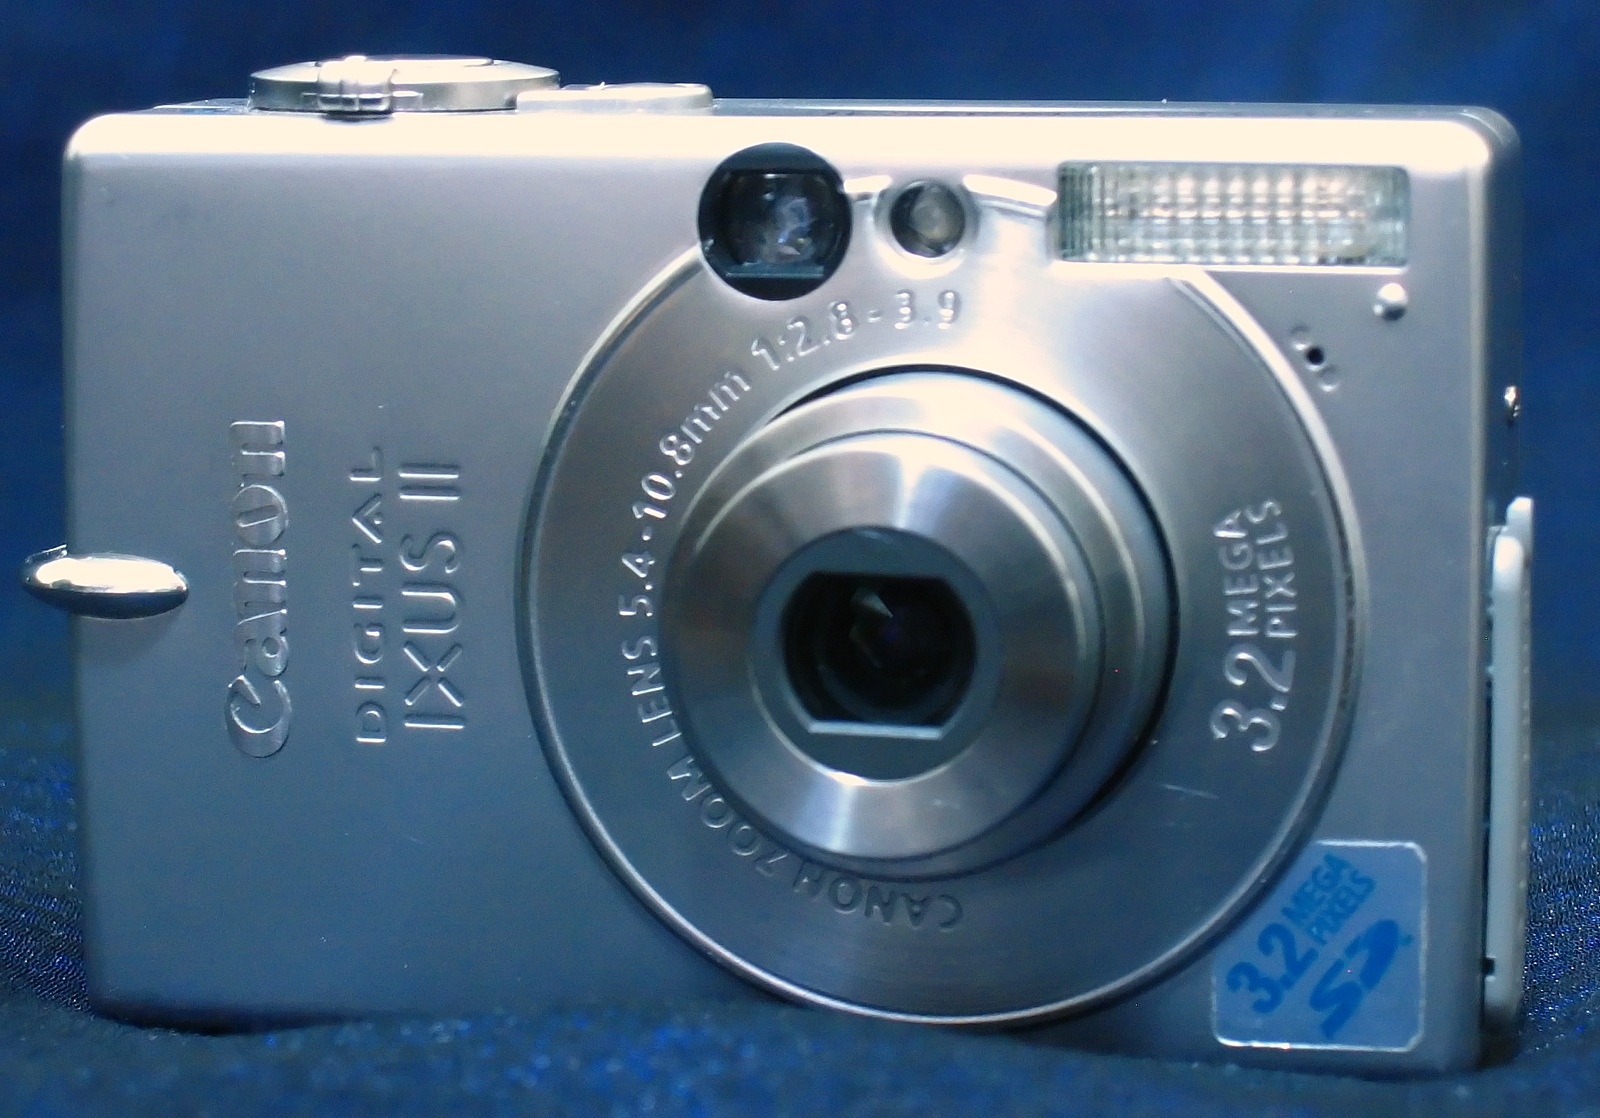 File:Canon Ixus II front.jpg